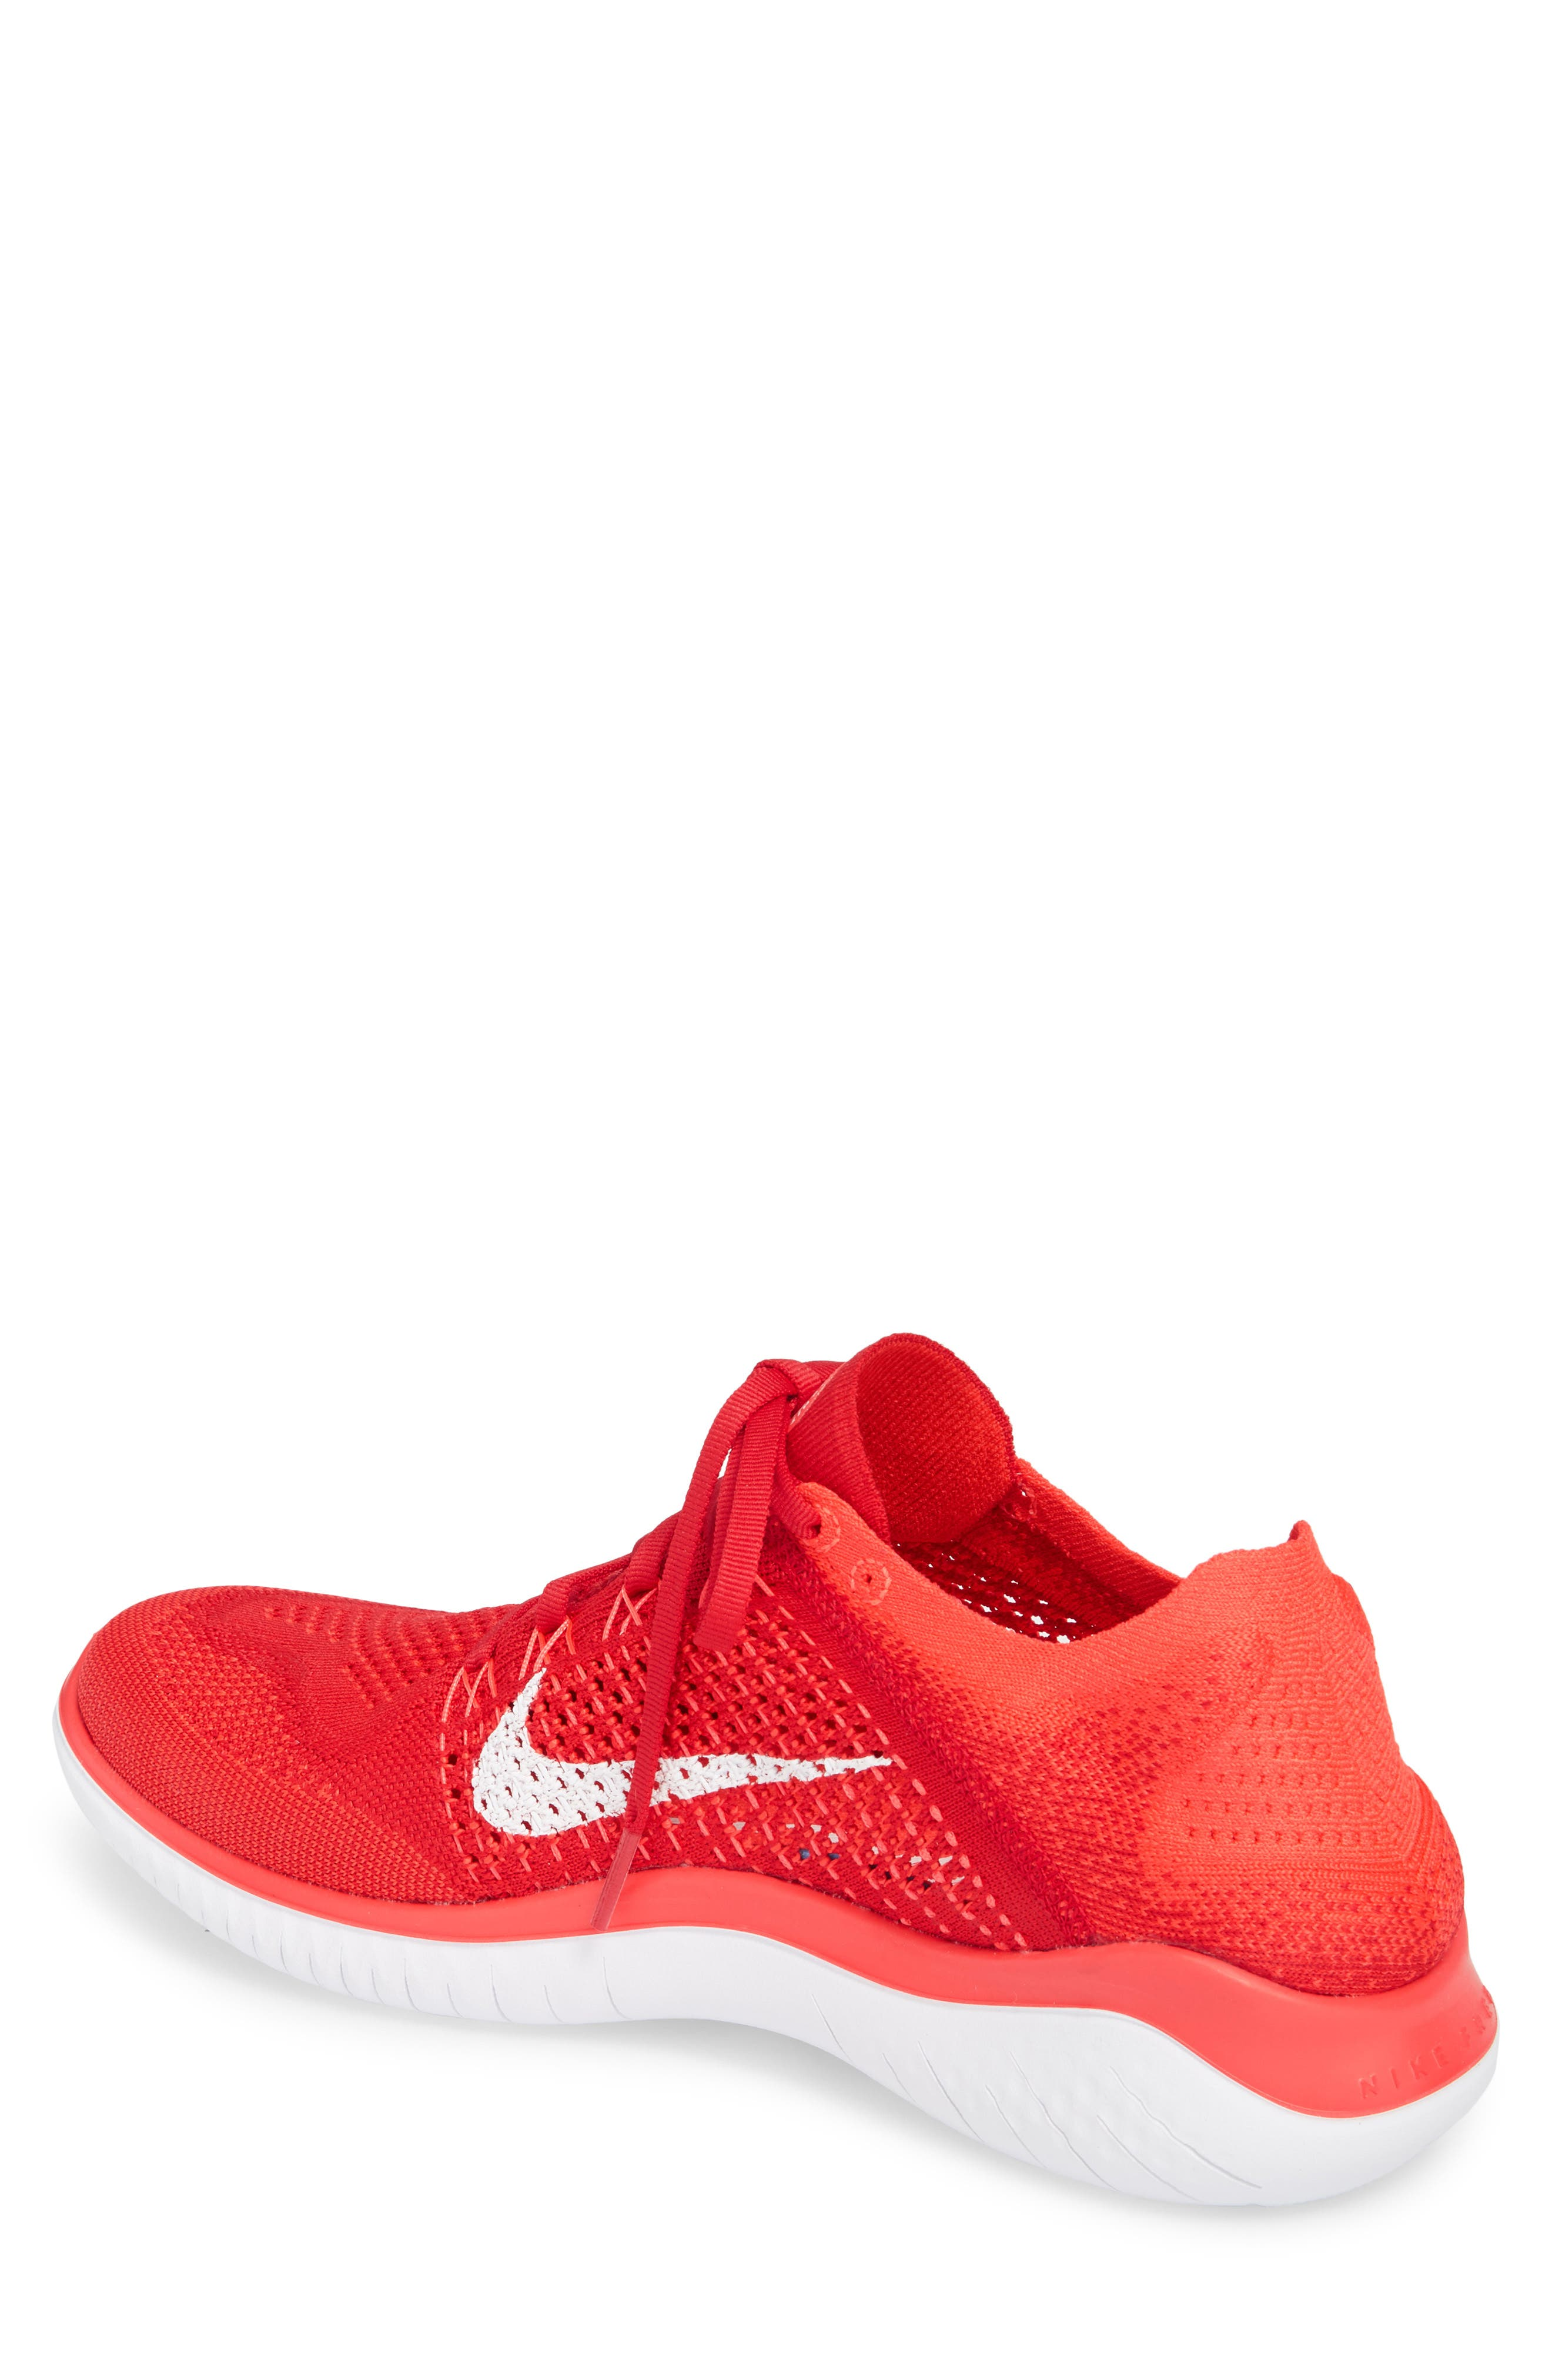 new style 3b84c b2781 Nike Flyknit  Nordstrom